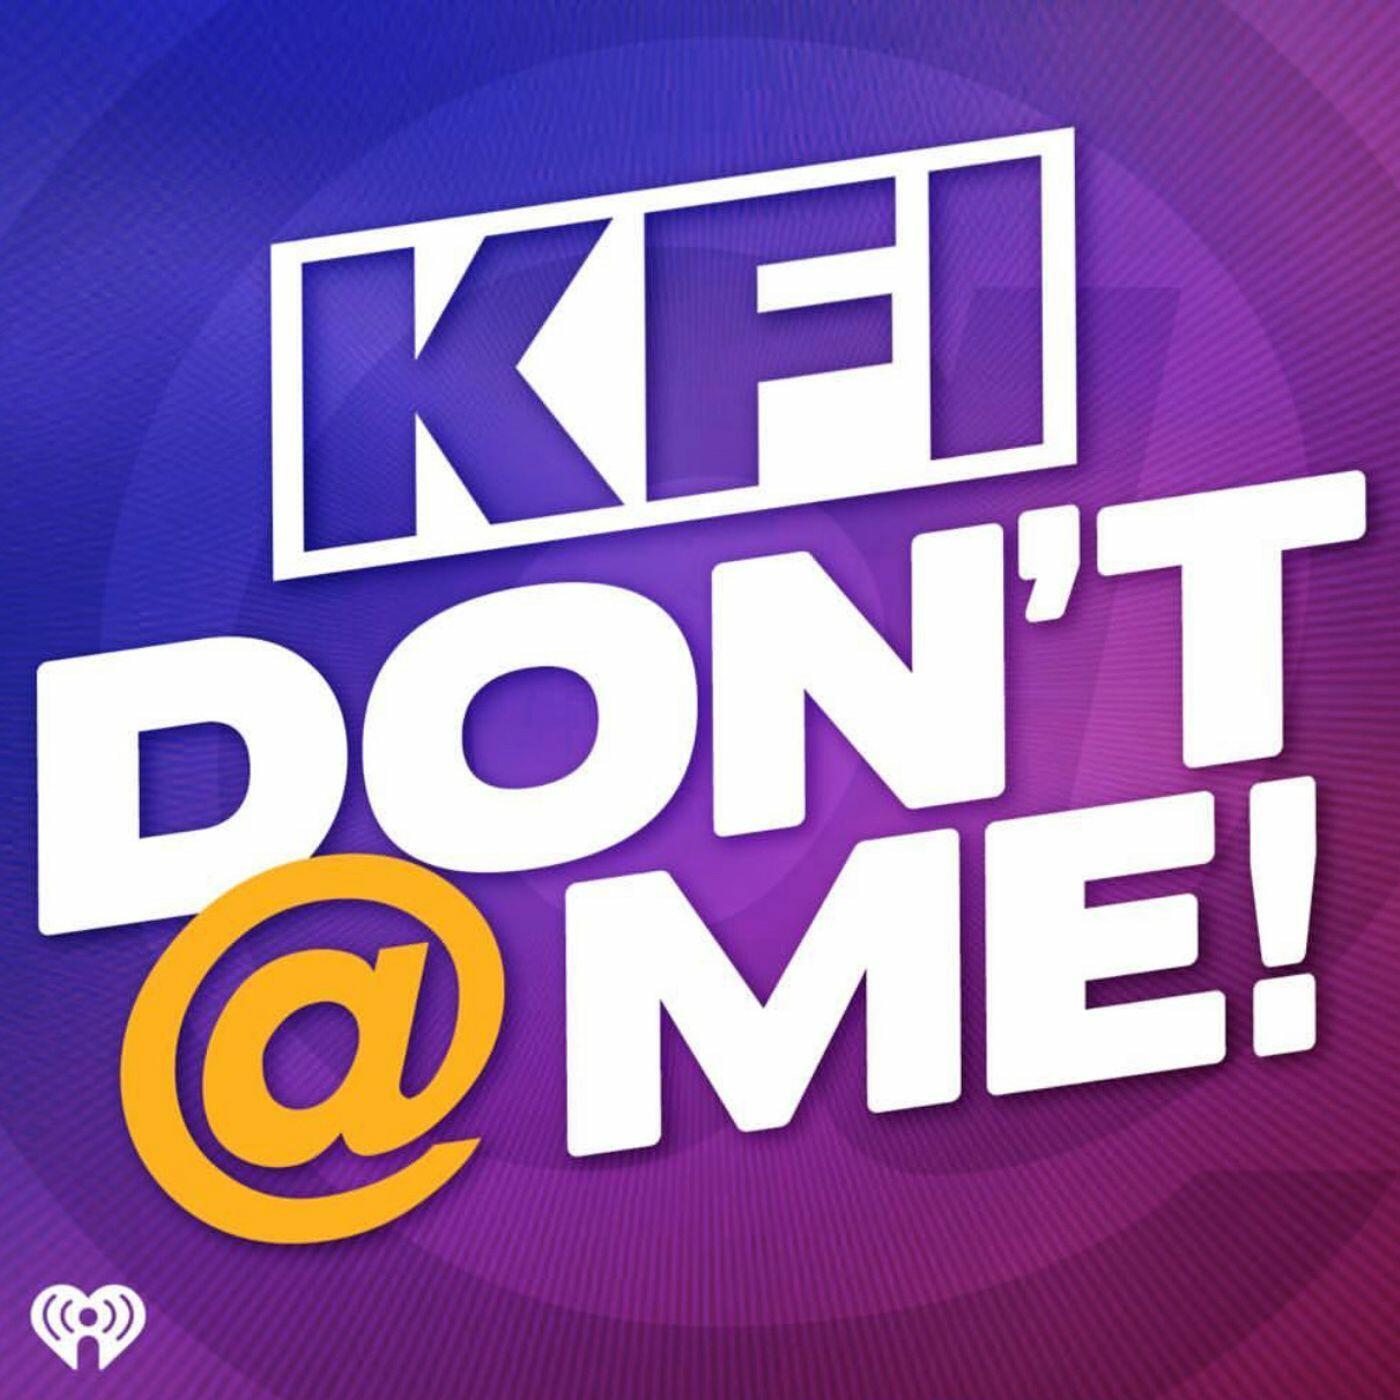 Listen to Make it Make Sense, Jussie! | KFI Don't @ Me | Podcasts